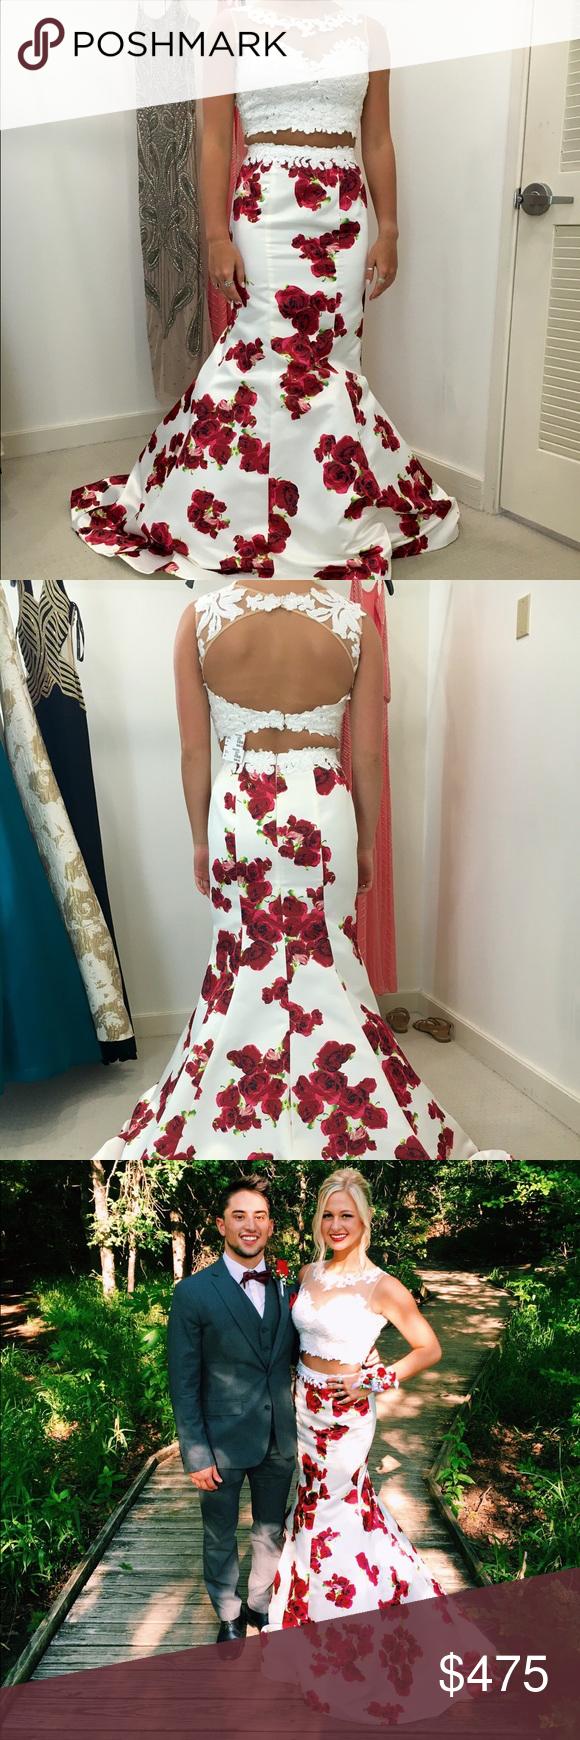 Jovani prom dress size